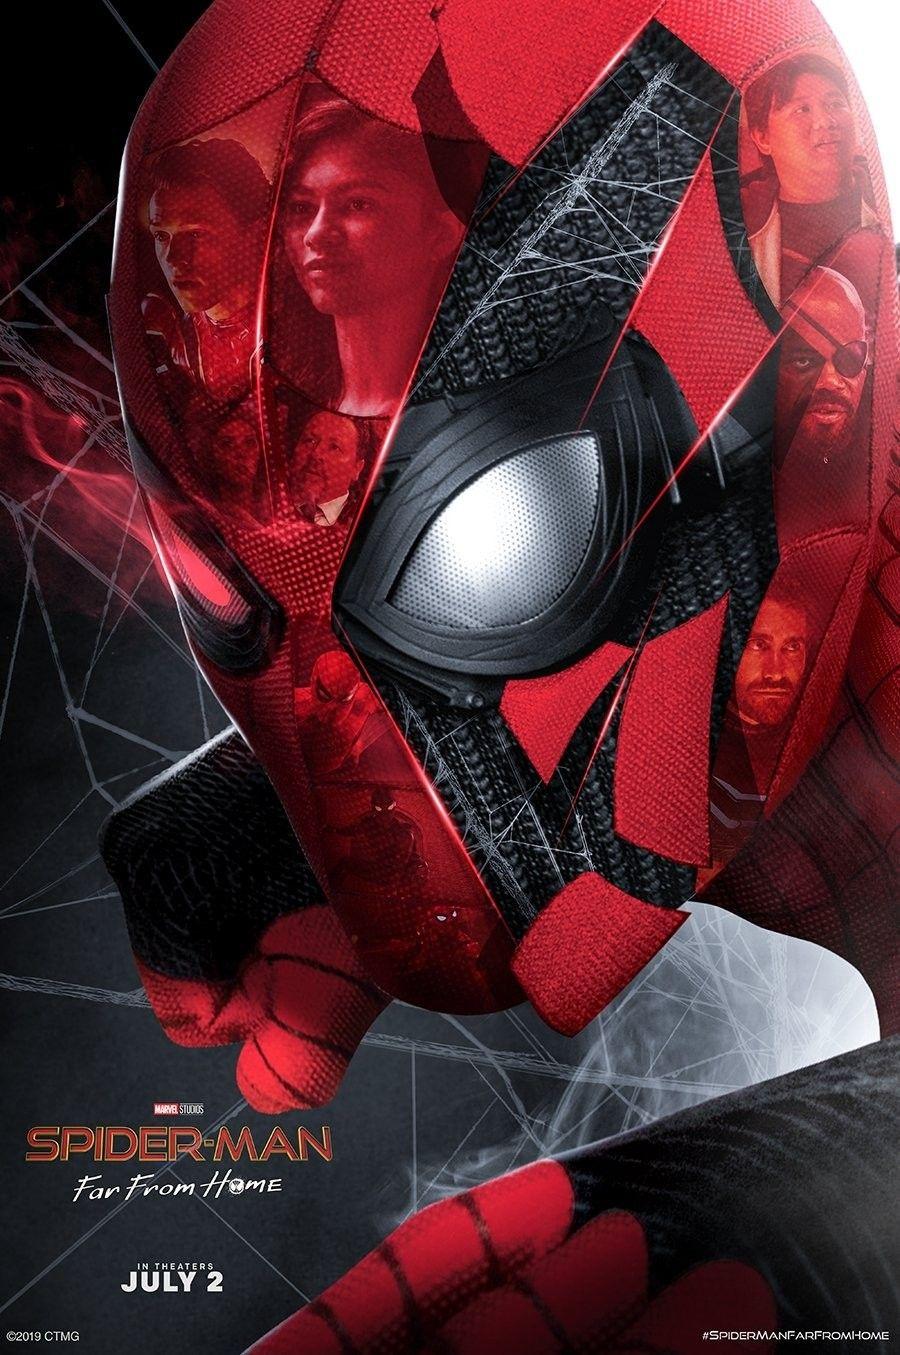 Spider Man Far From Home Art By Bosslogic マーベルヒーロー アベンジャーズ 高画質 壁紙